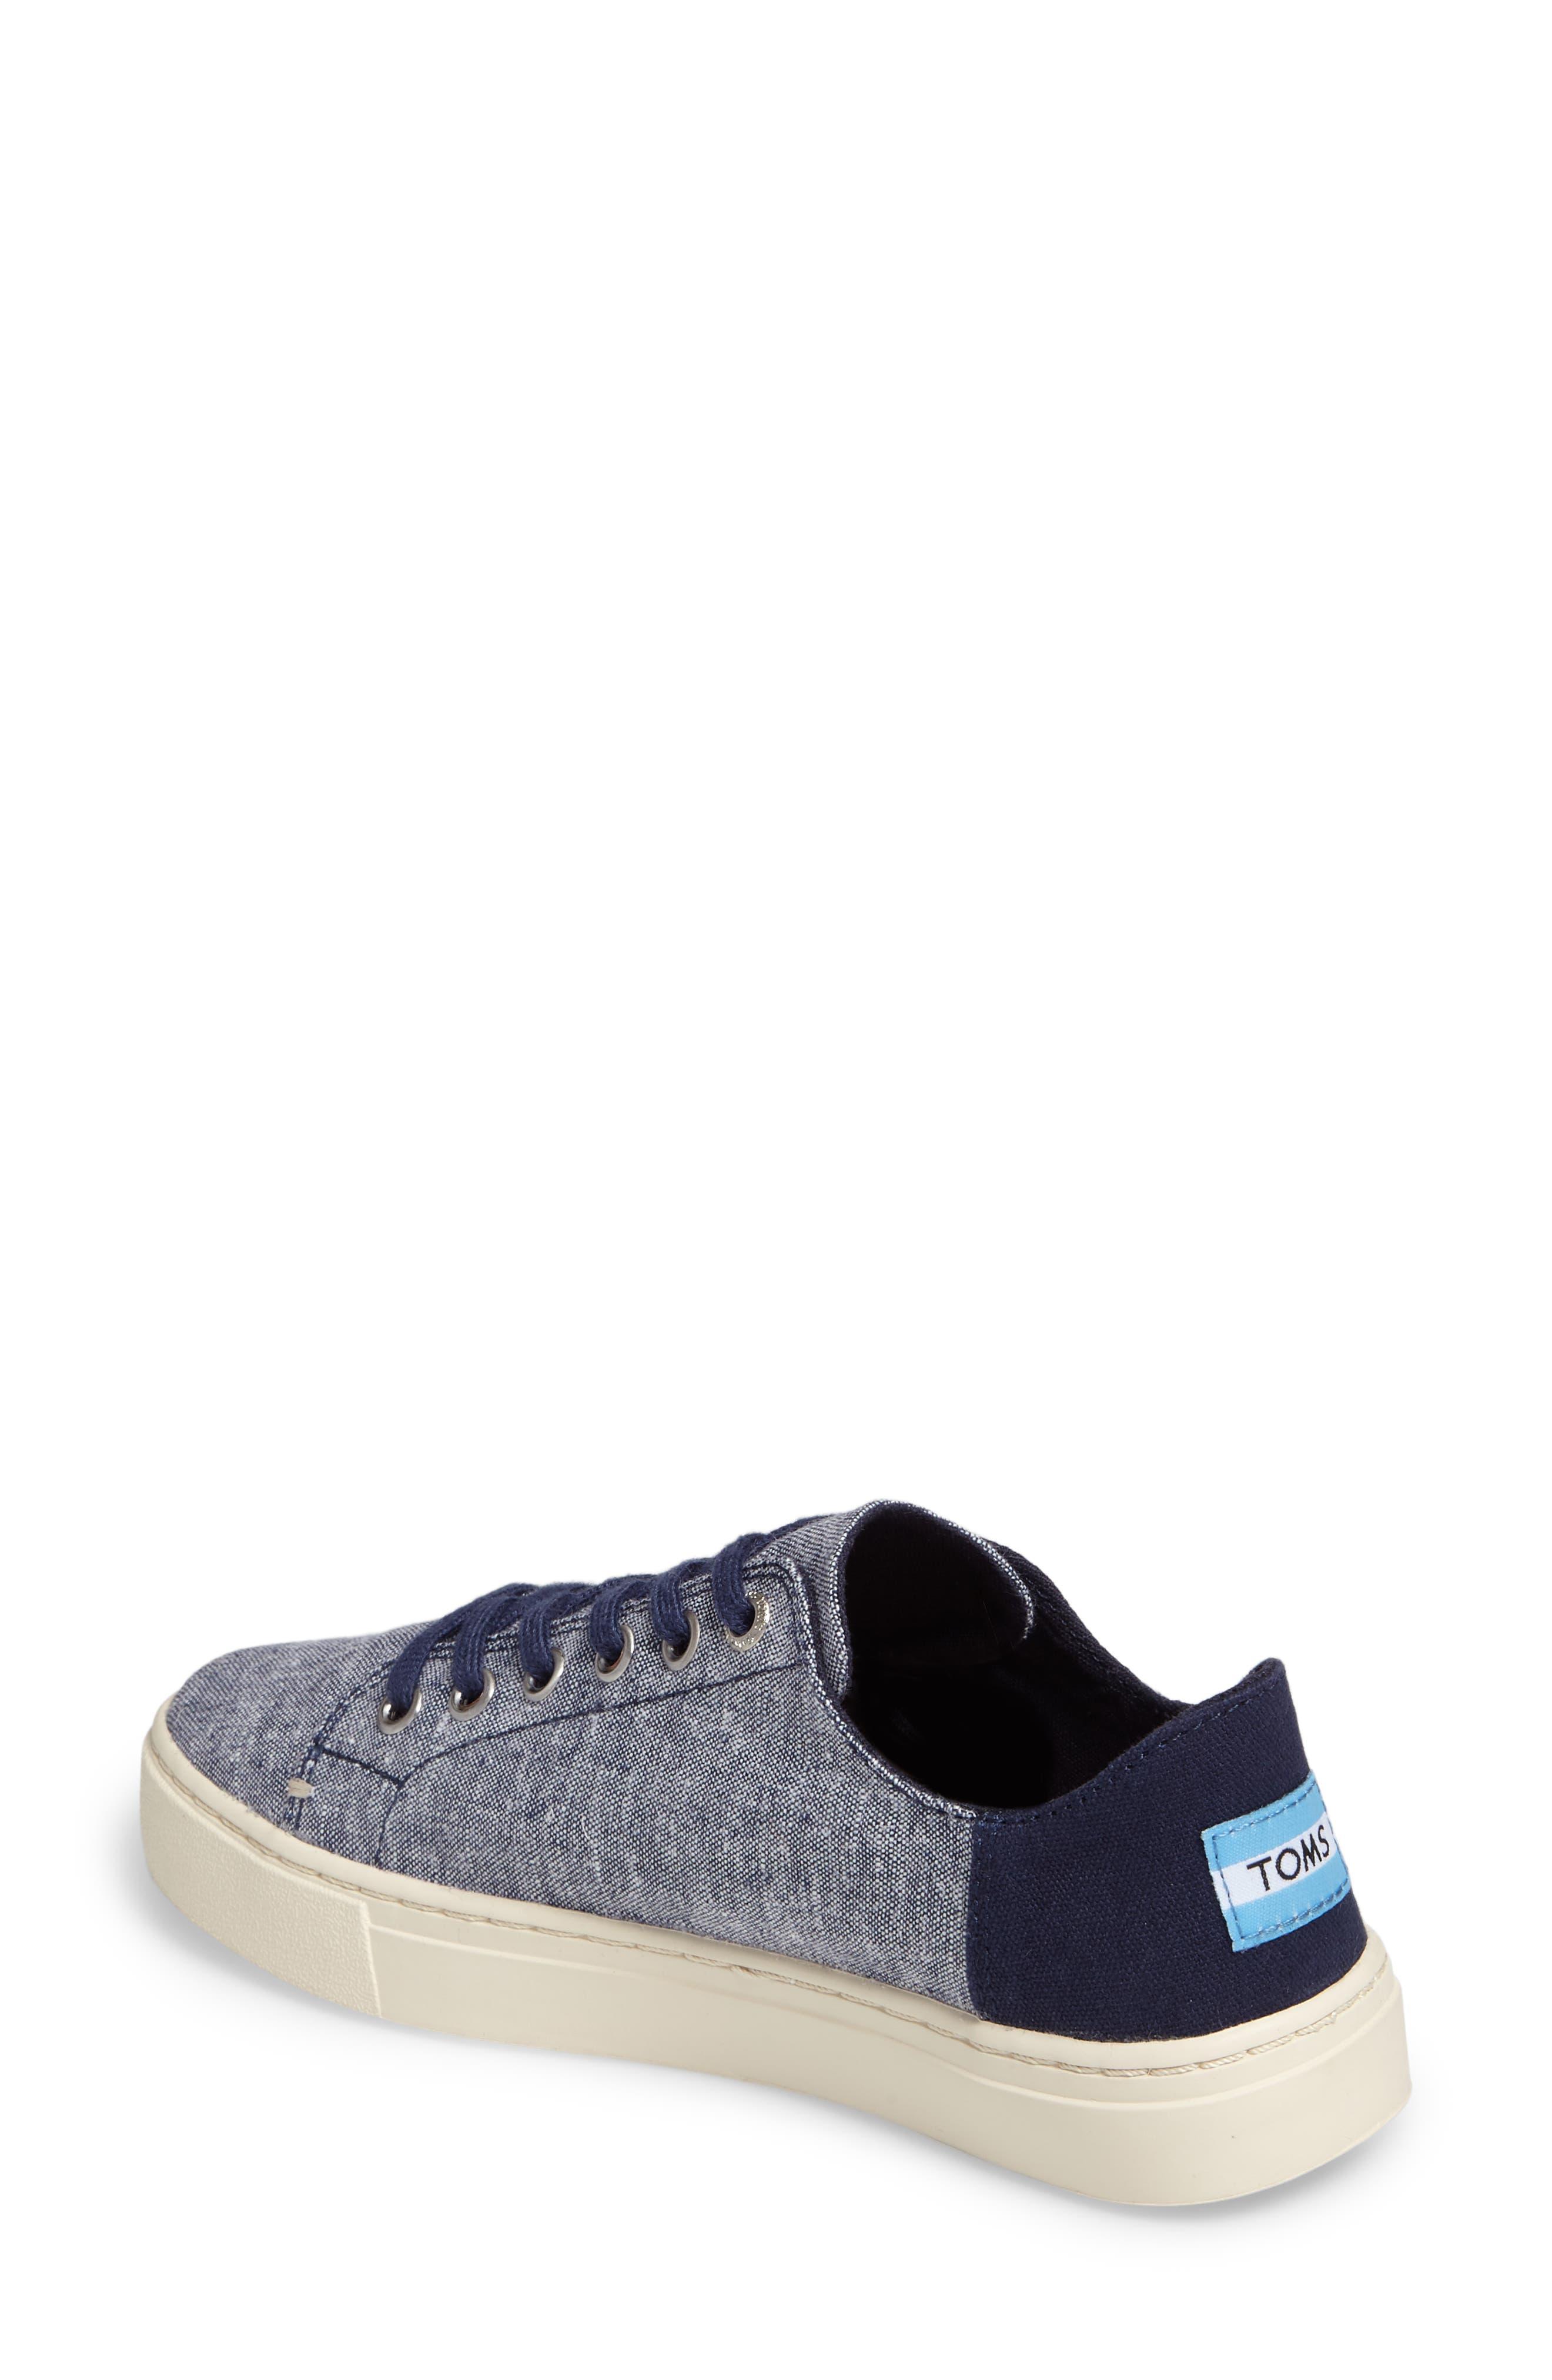 Lenox Sneaker,                             Alternate thumbnail 26, color,